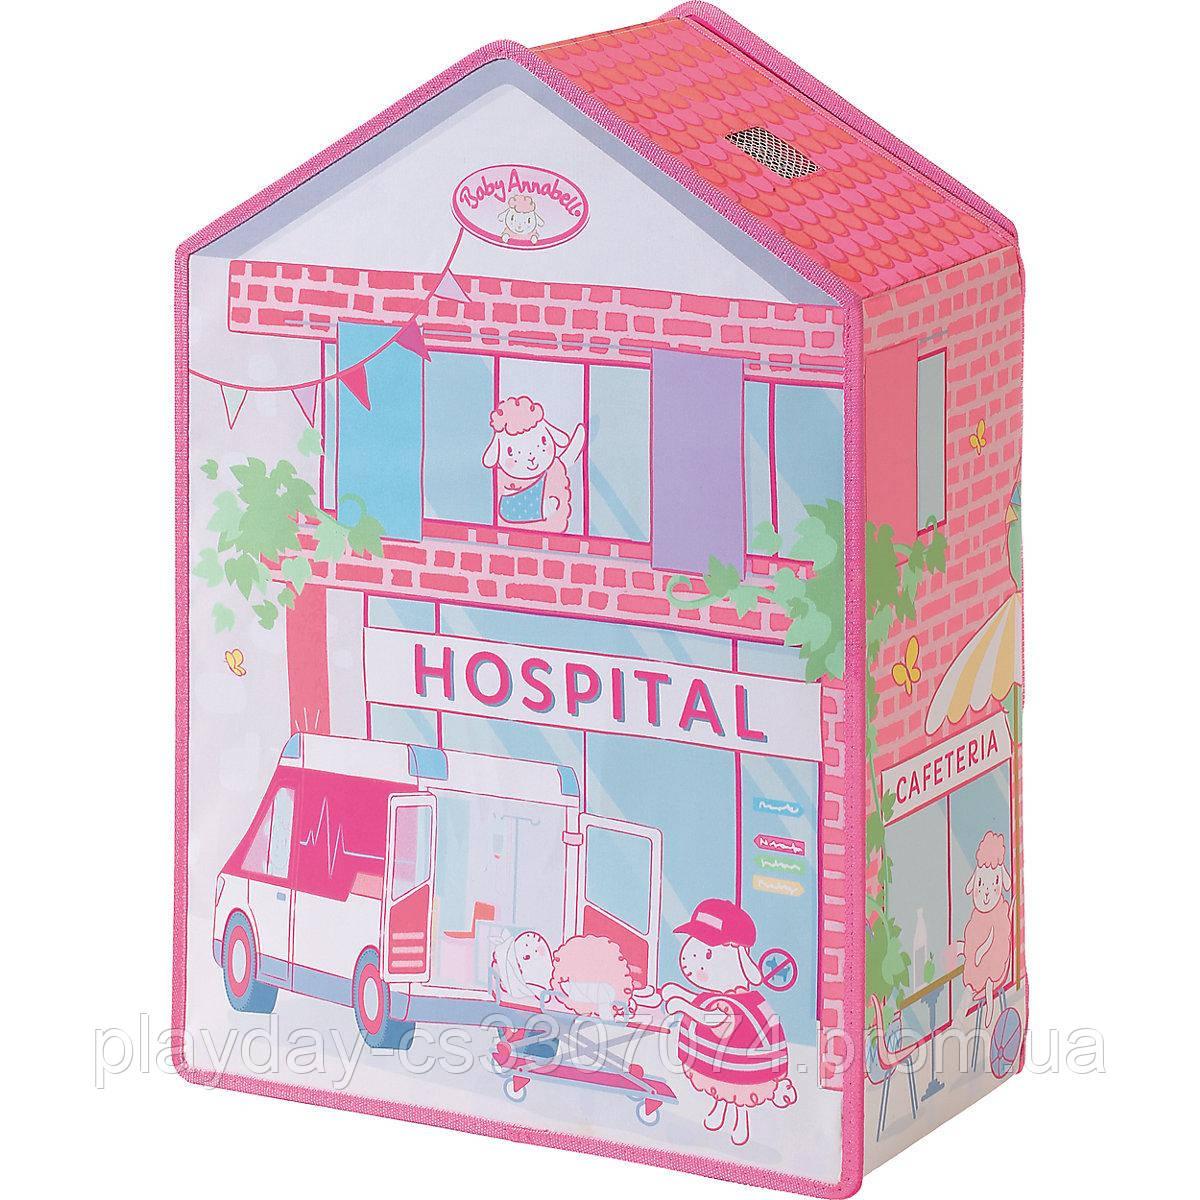 Эксклюзив!! Больница для Baby Annabell от Zapf Creation Baby Annabell Hospital